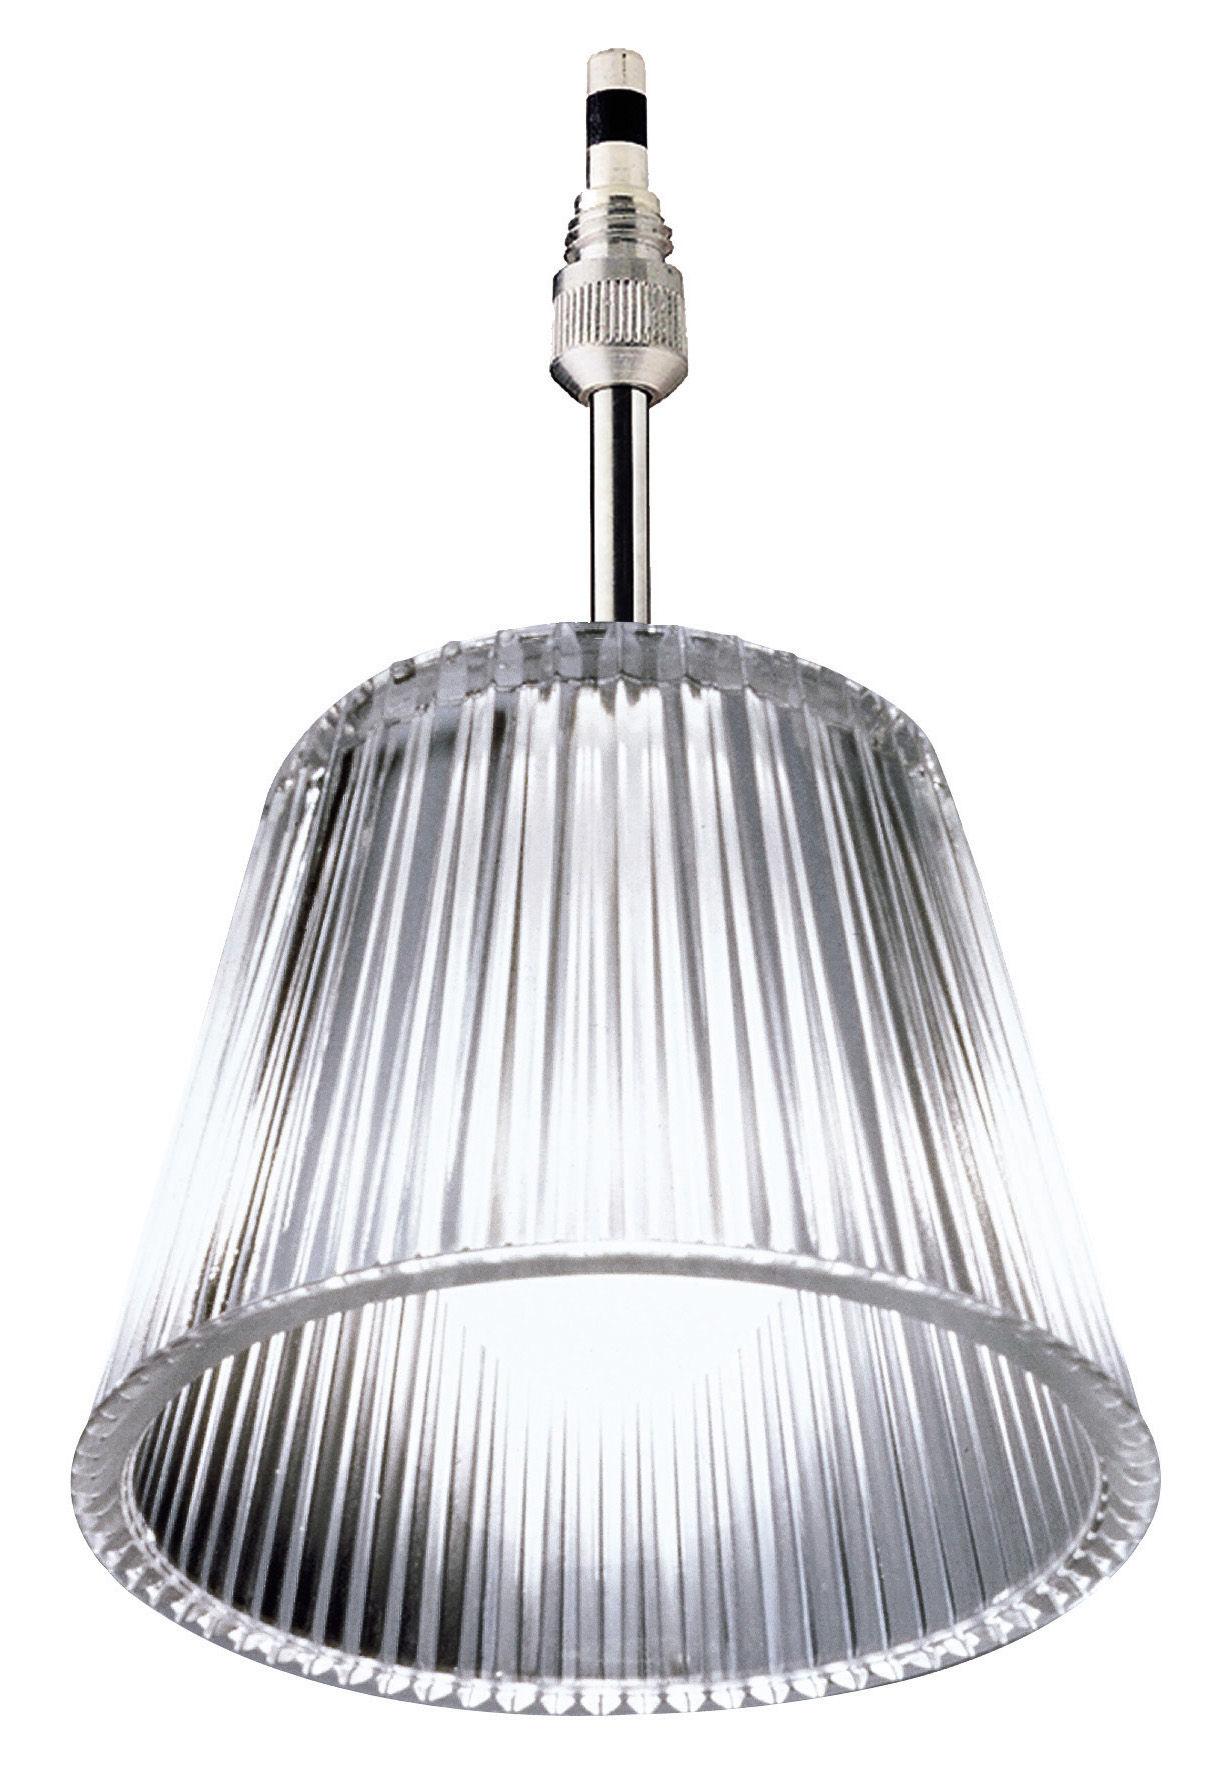 Lighting - Pendant Lighting - Romeo Babe Glass Pendant by Flos - Glass - Glass